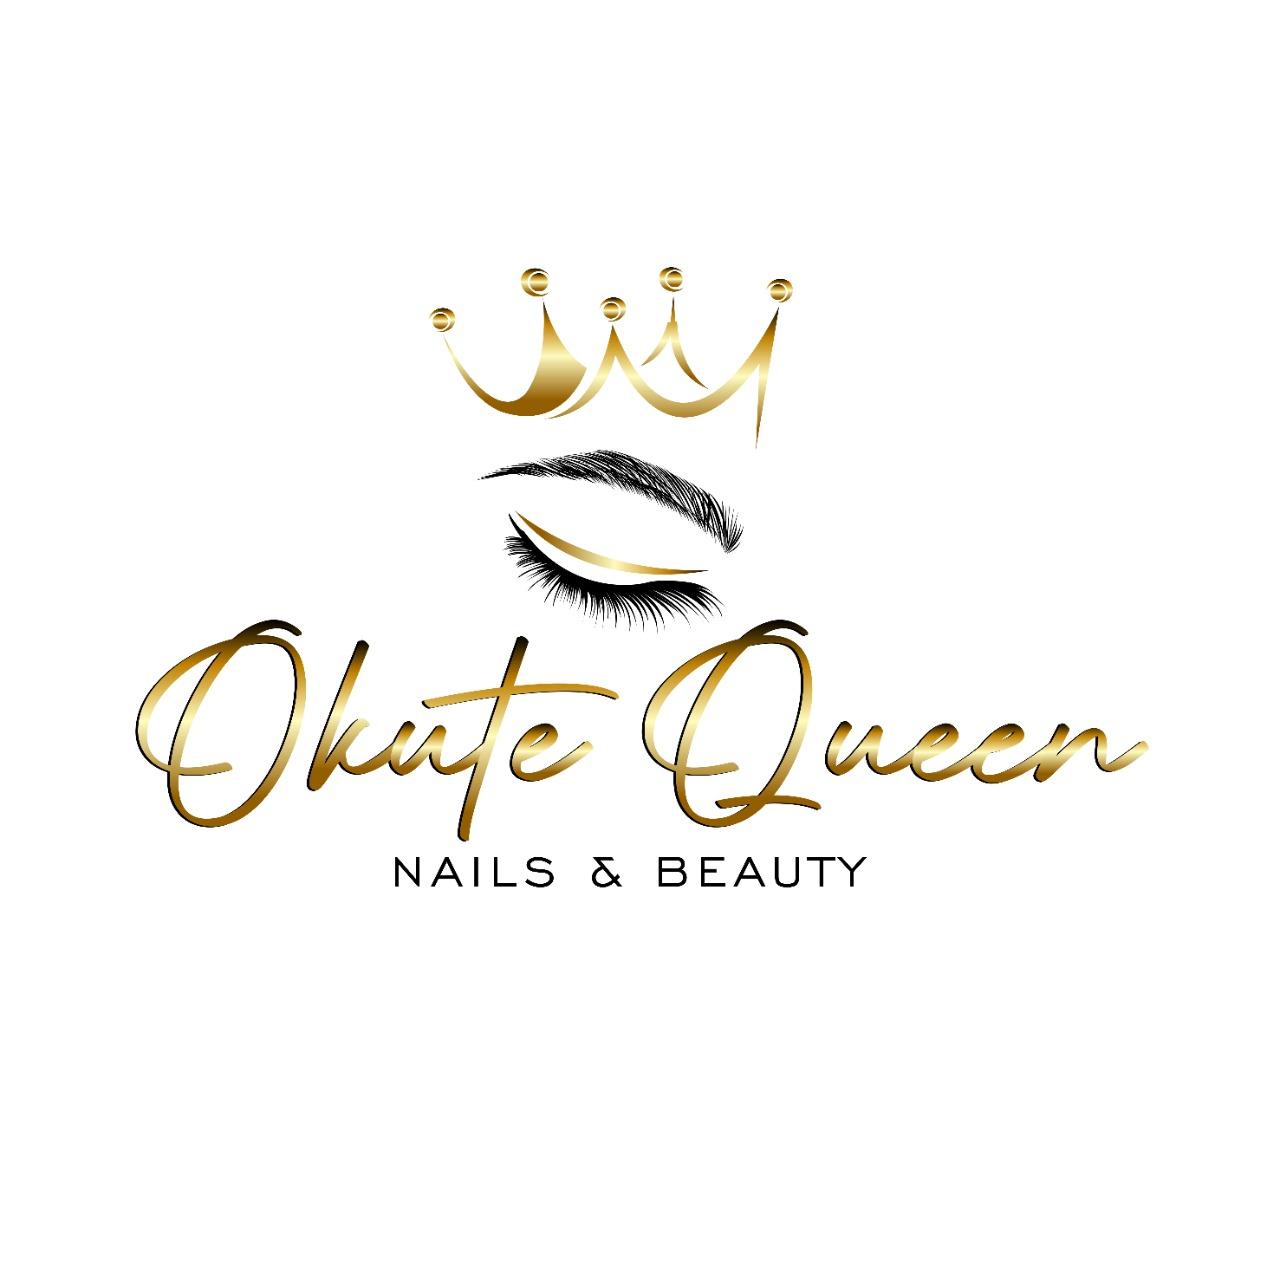 Okute Queen nails & beauty